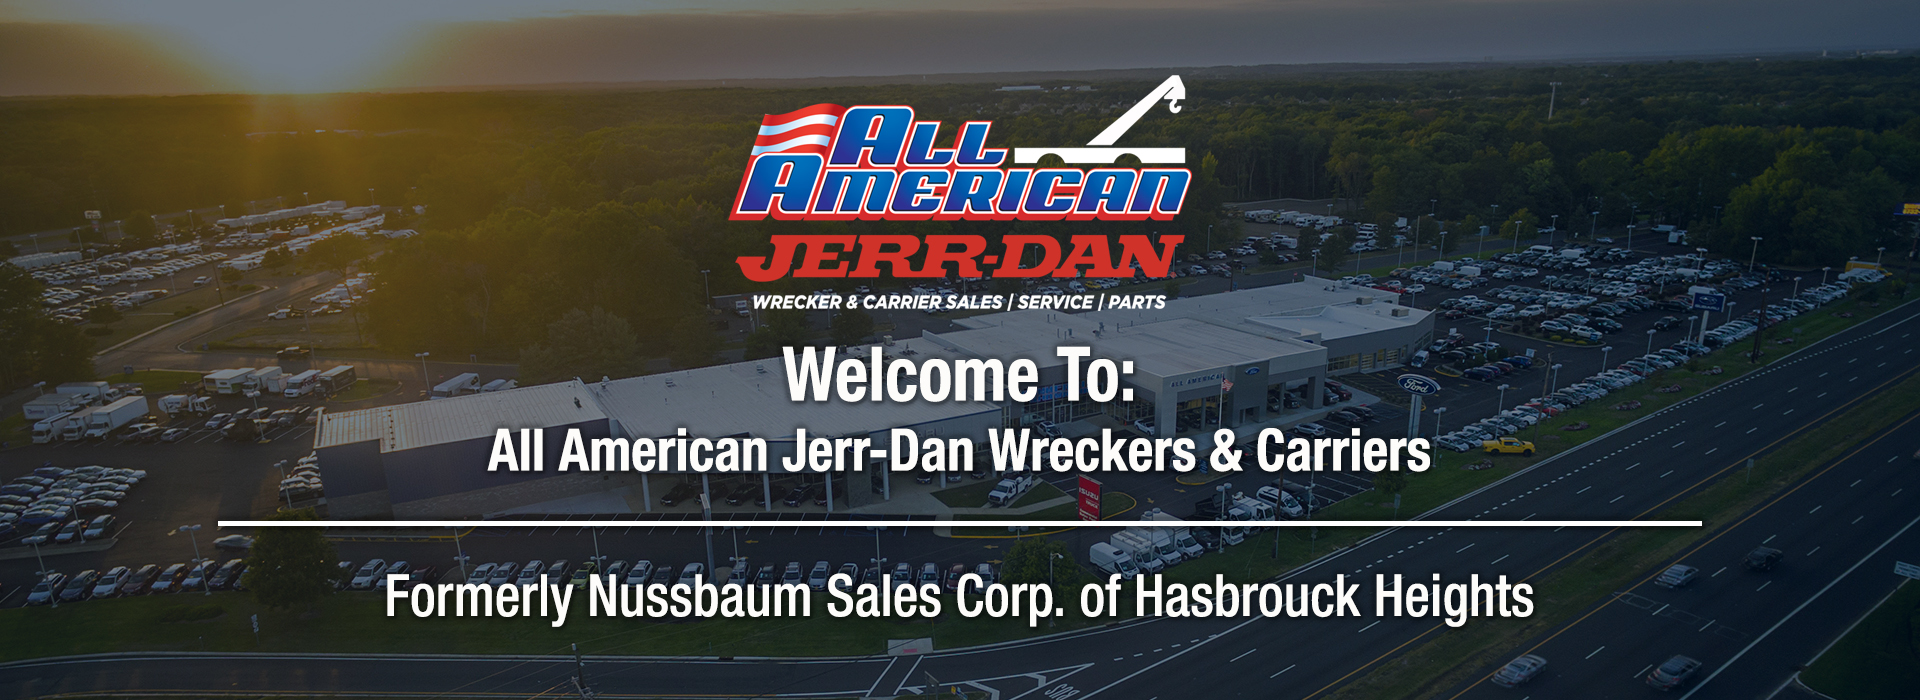 Jerr-Dan - All American Commercial Trucks